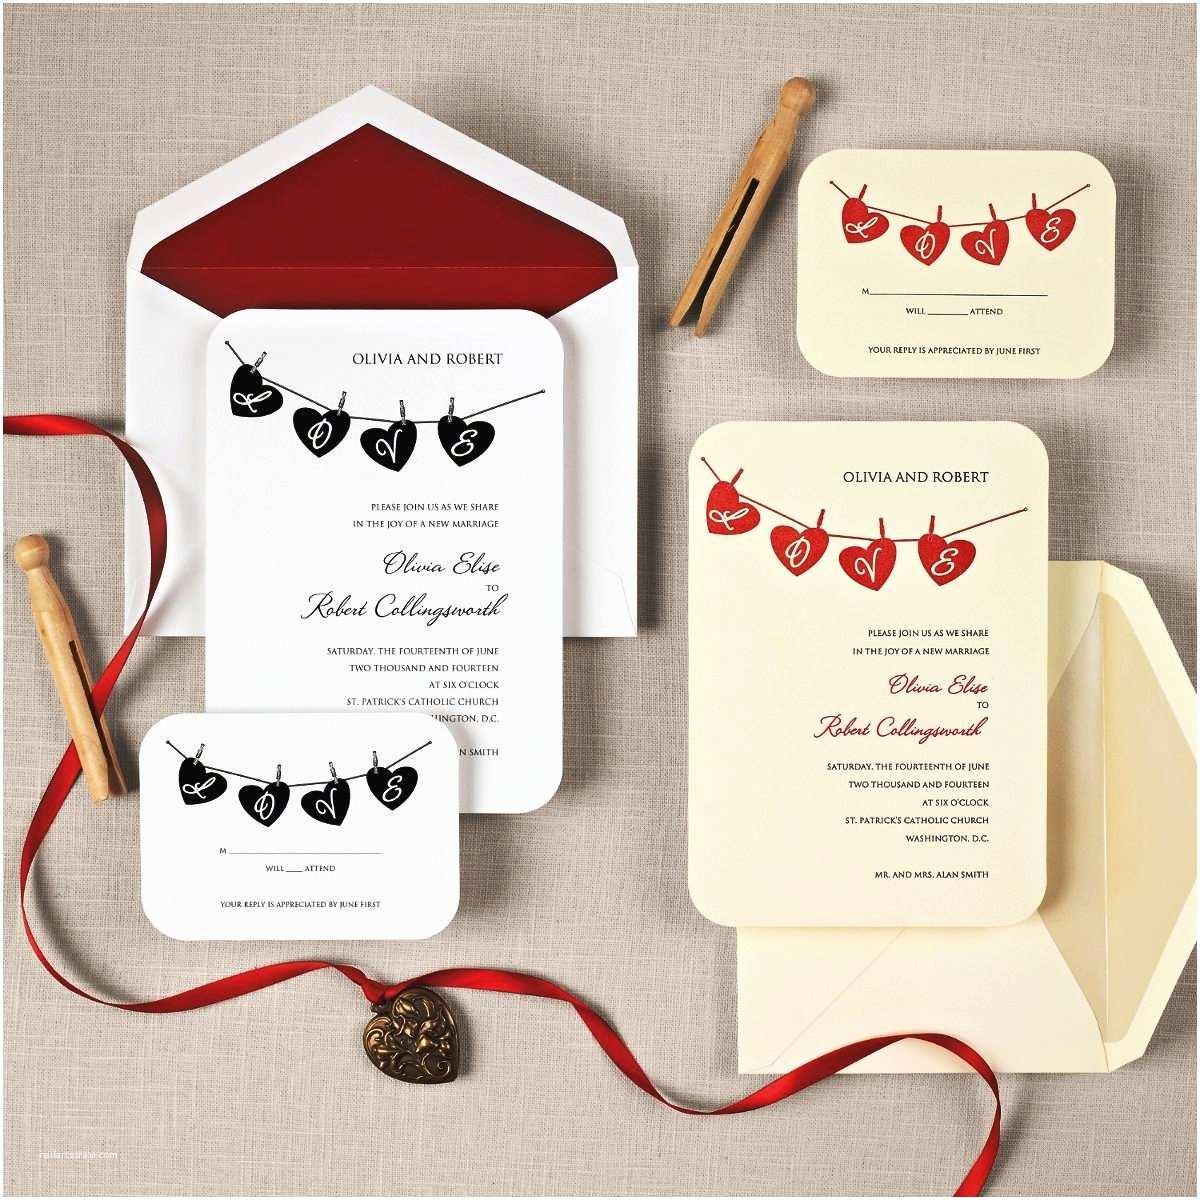 Cool Wedding Invitations Most Unique Wedding Invitations — Criolla Brithday